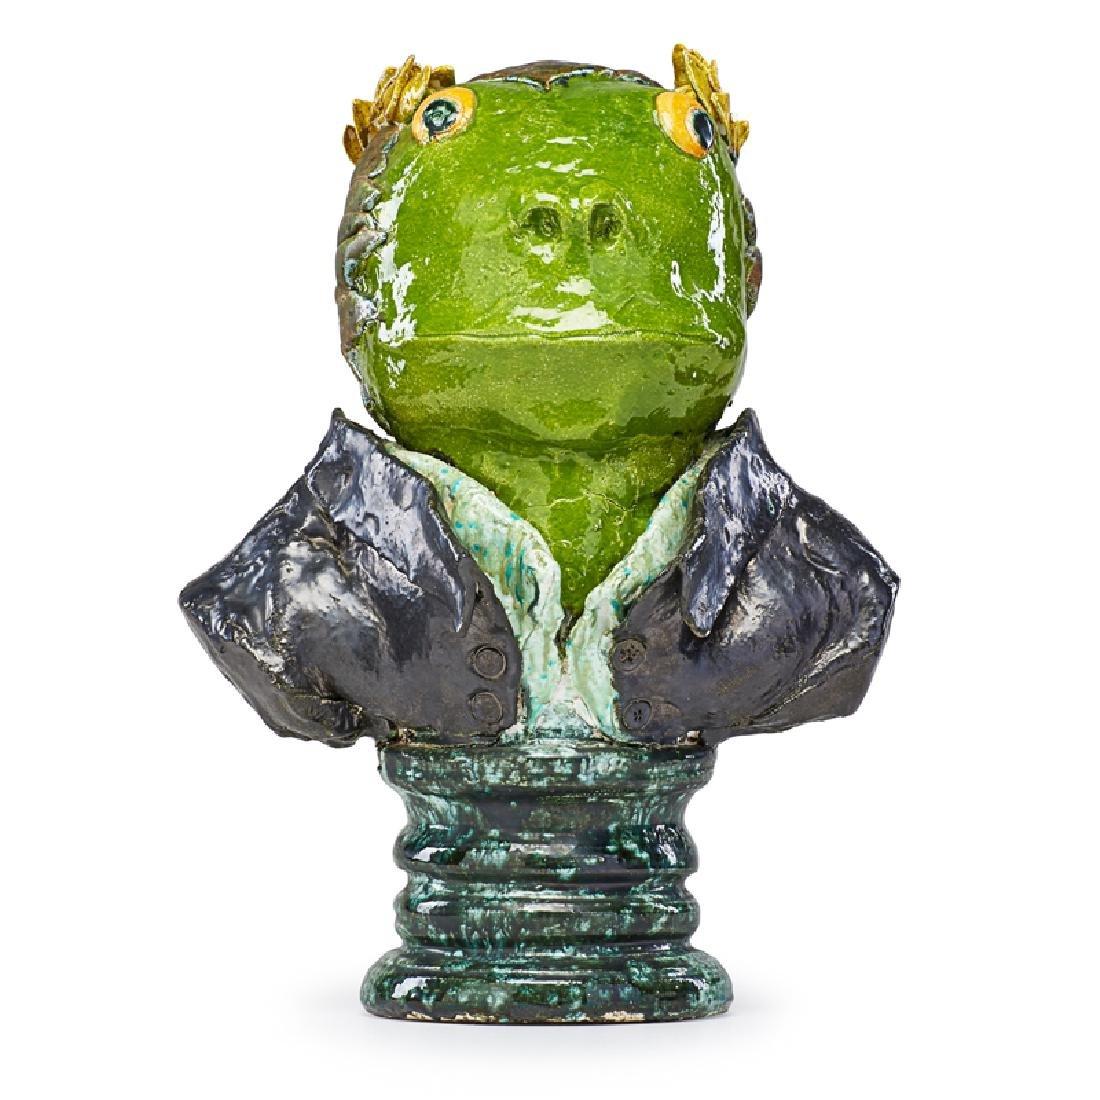 DAVID GILHOOLY Frog bust (Napoleon Bonaparte)